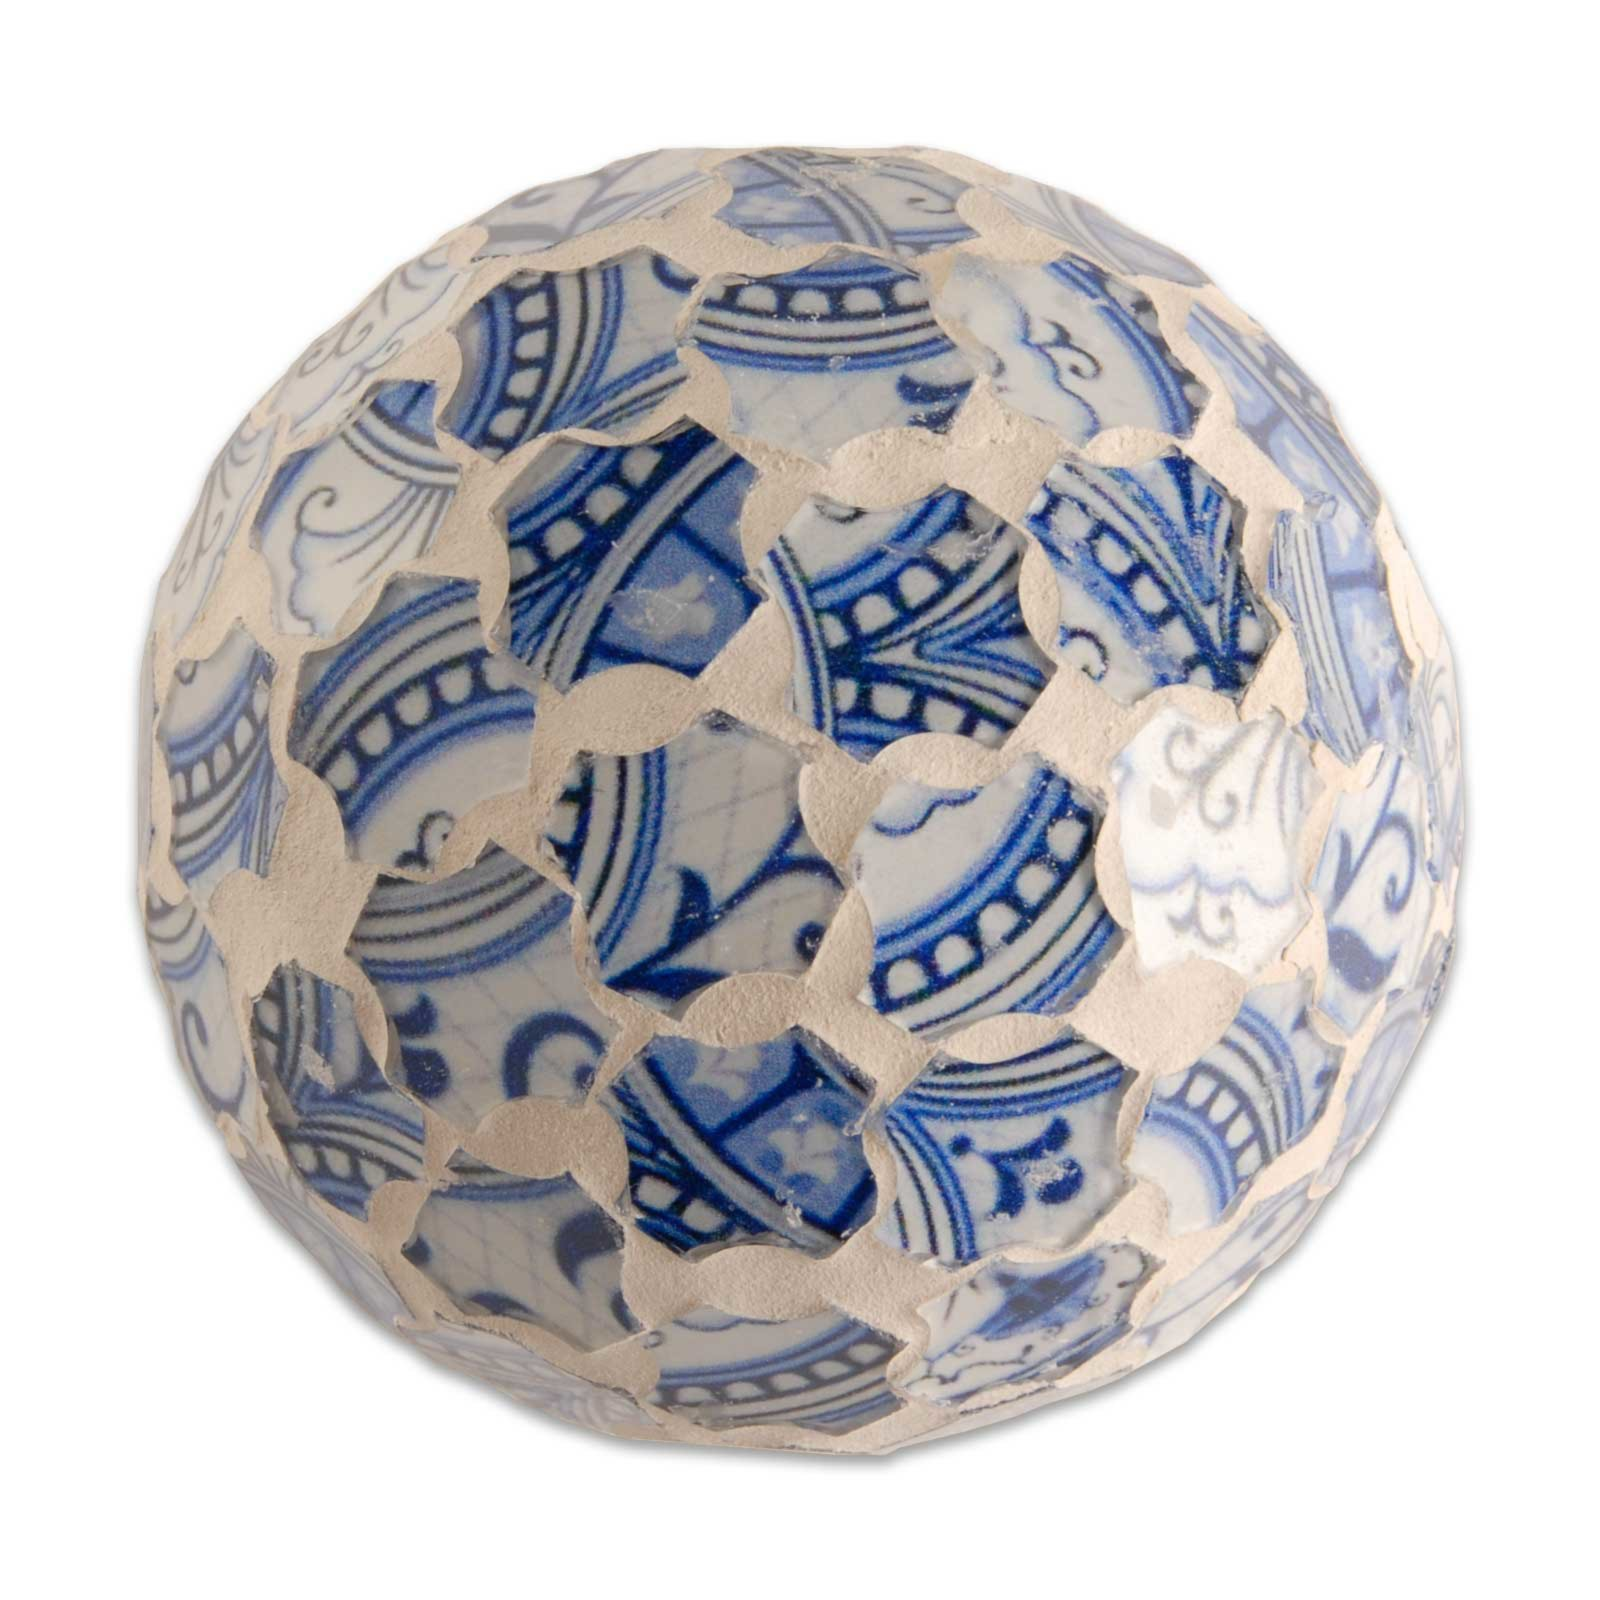 Dekokugel - blau-weiß - Mosaik - 8,5 cm